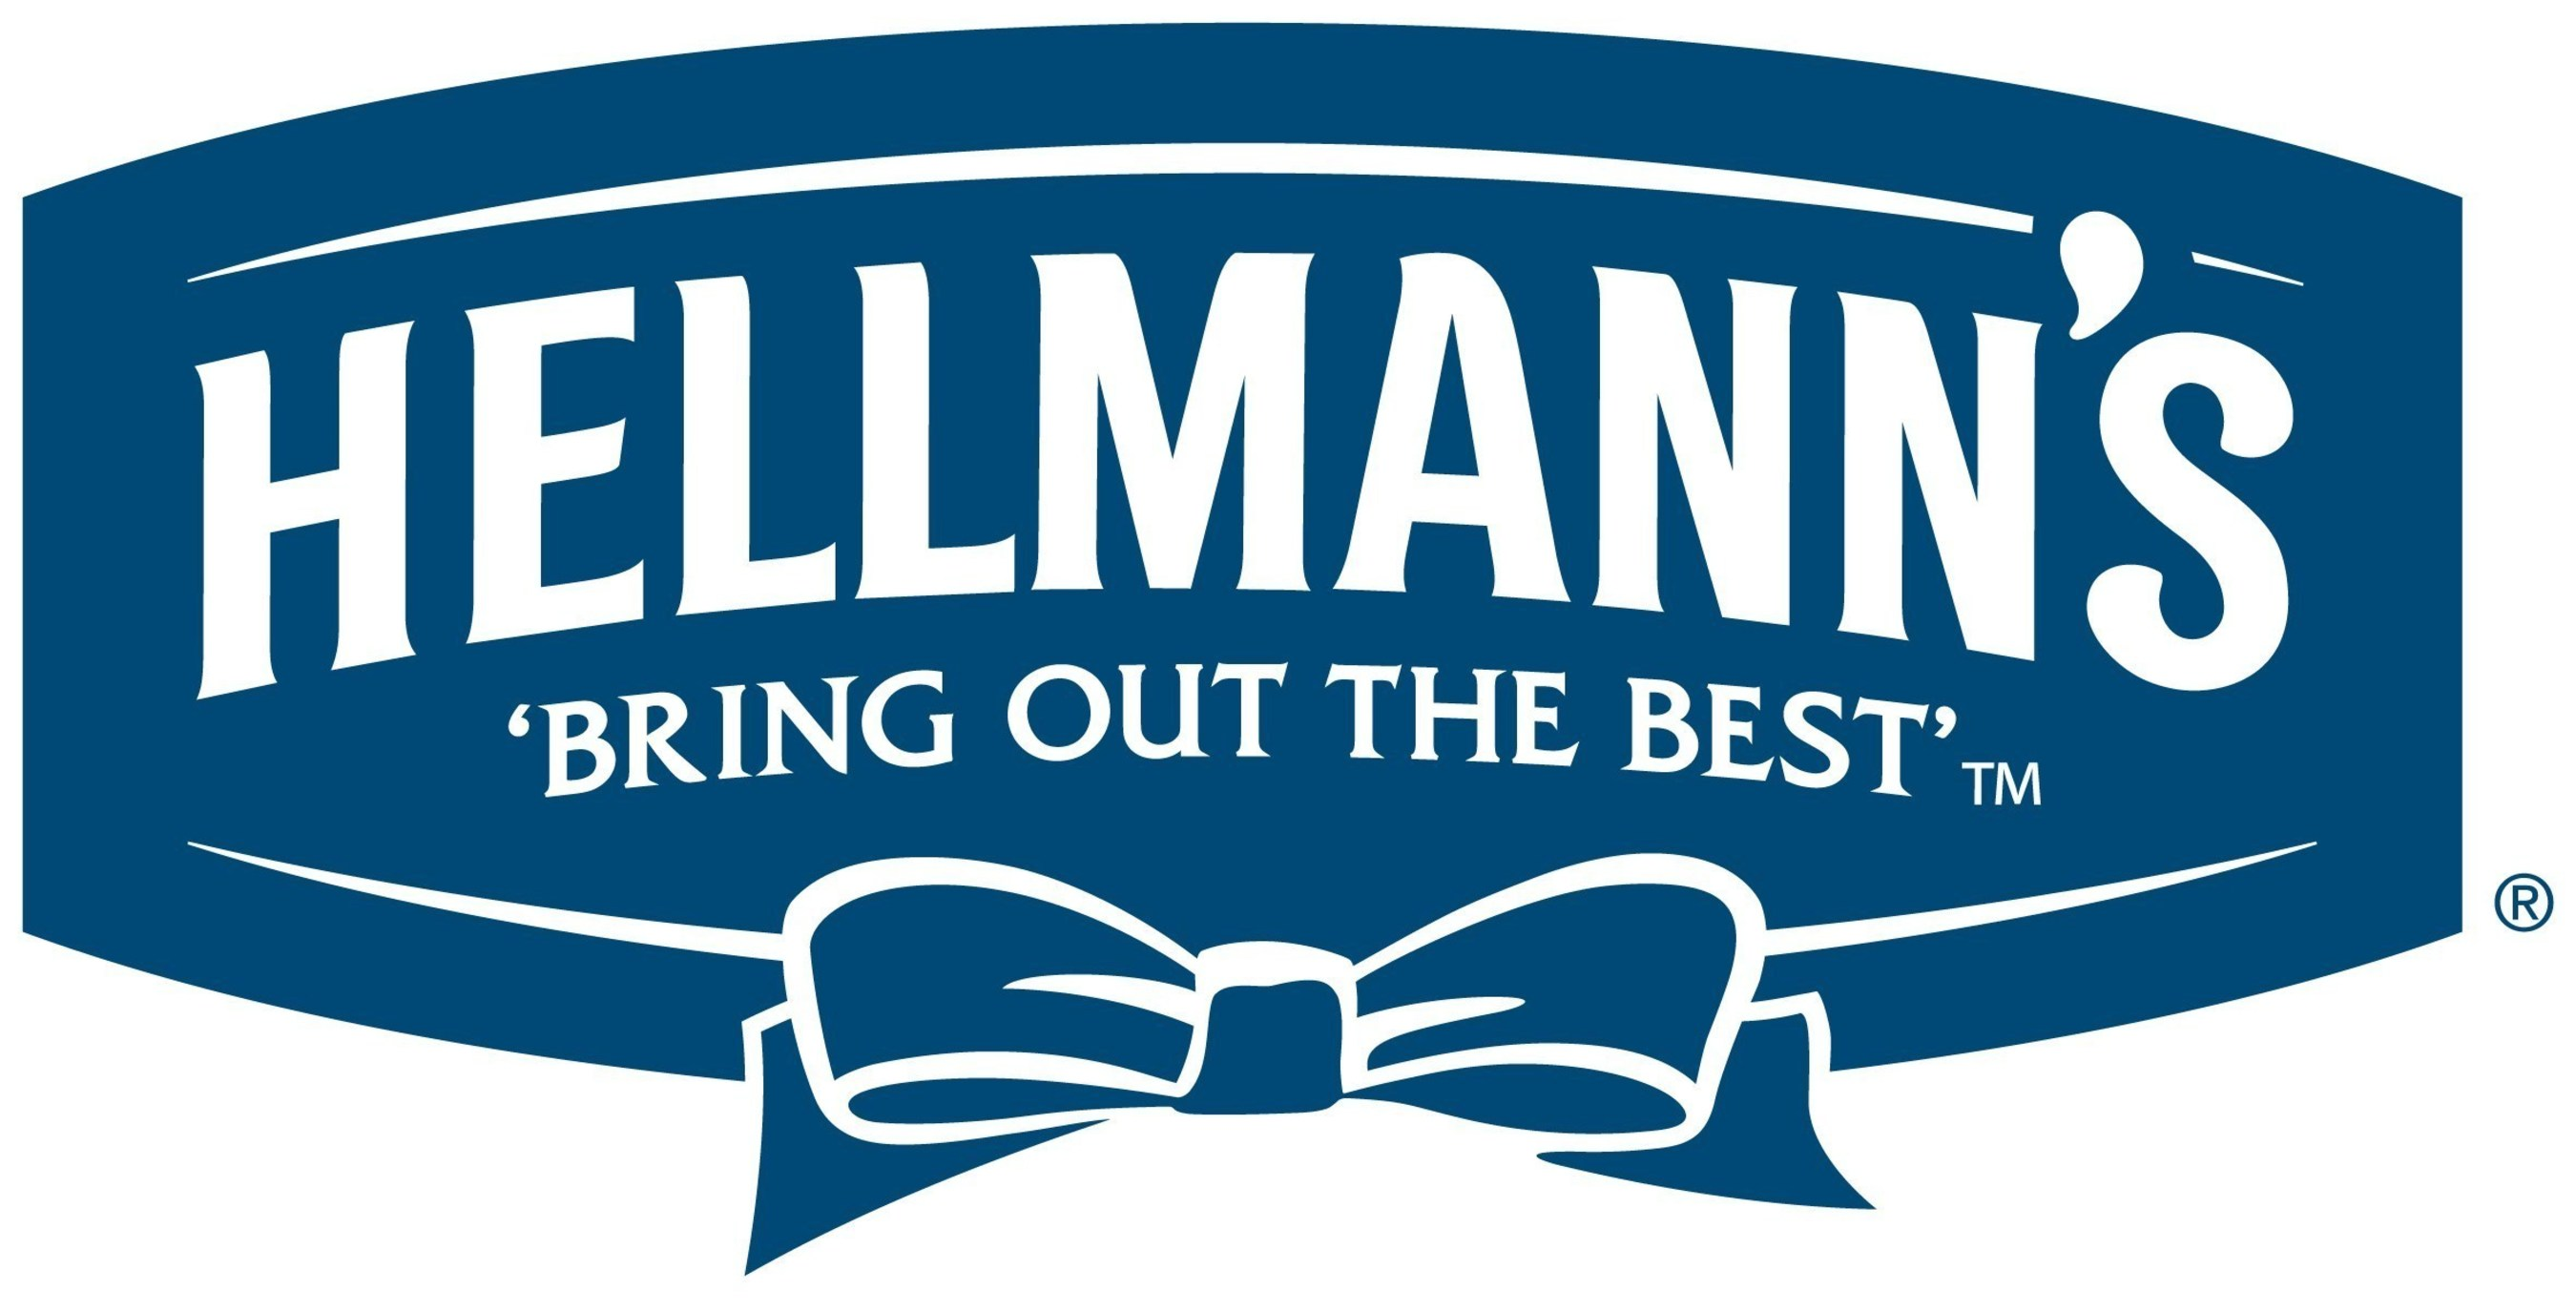 Hellmann's Eggless Spread Receives Vegan Certification From Vegan ...